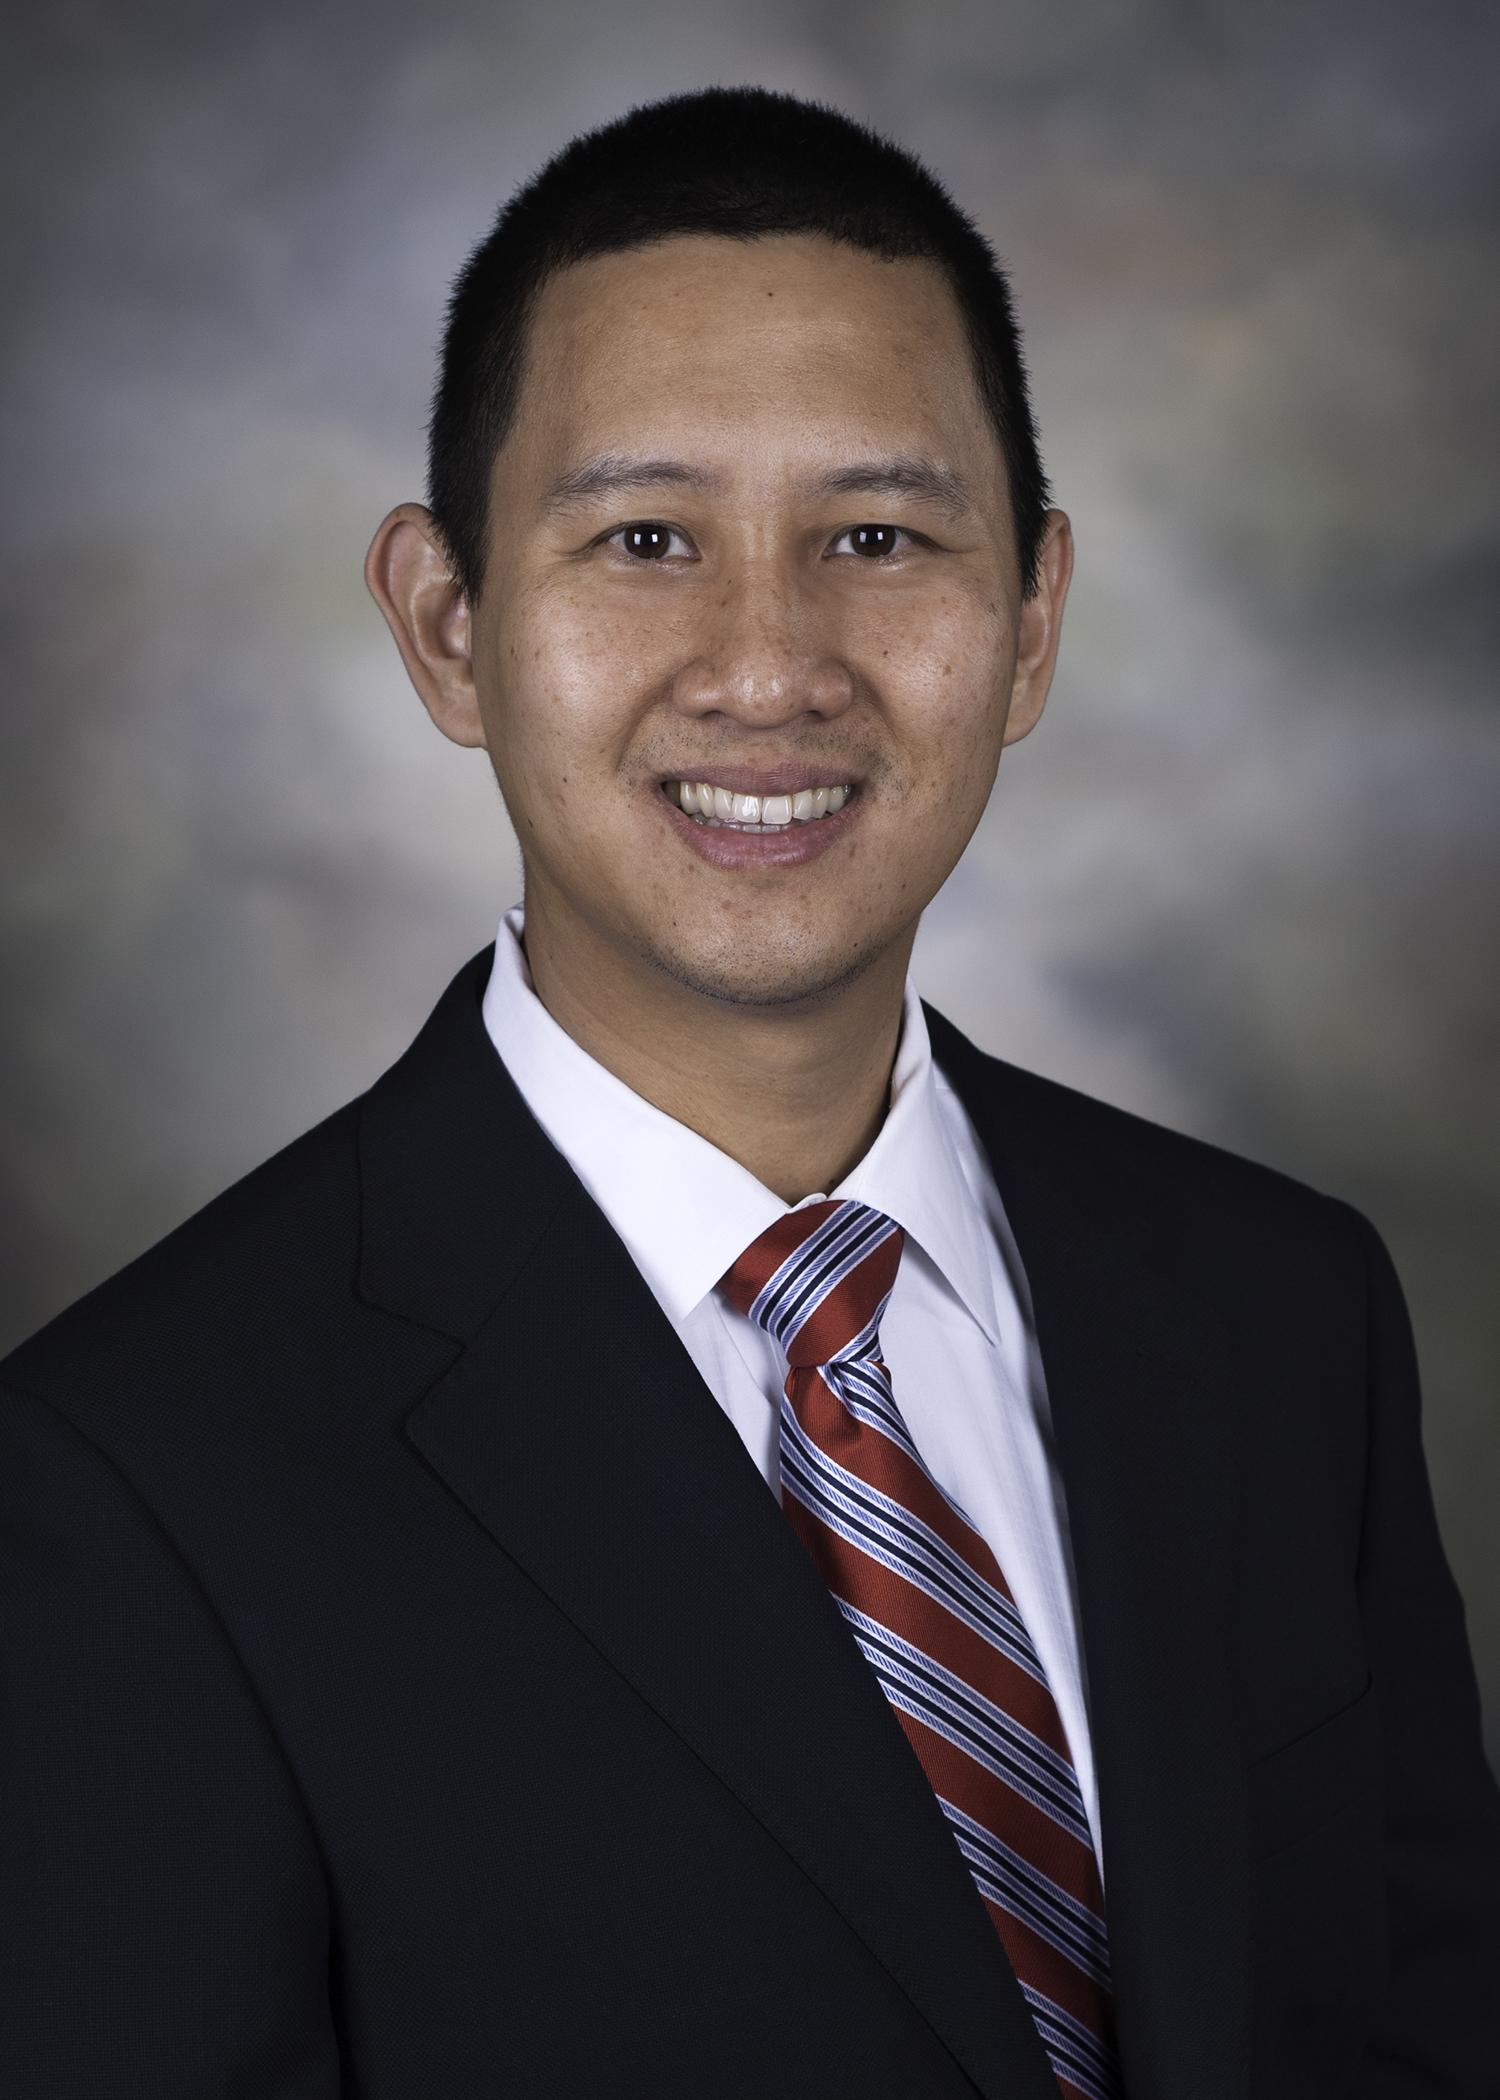 University Of Texas Health Science Center San Antonio >> Patrick Nguyen | UT Health San Antonio